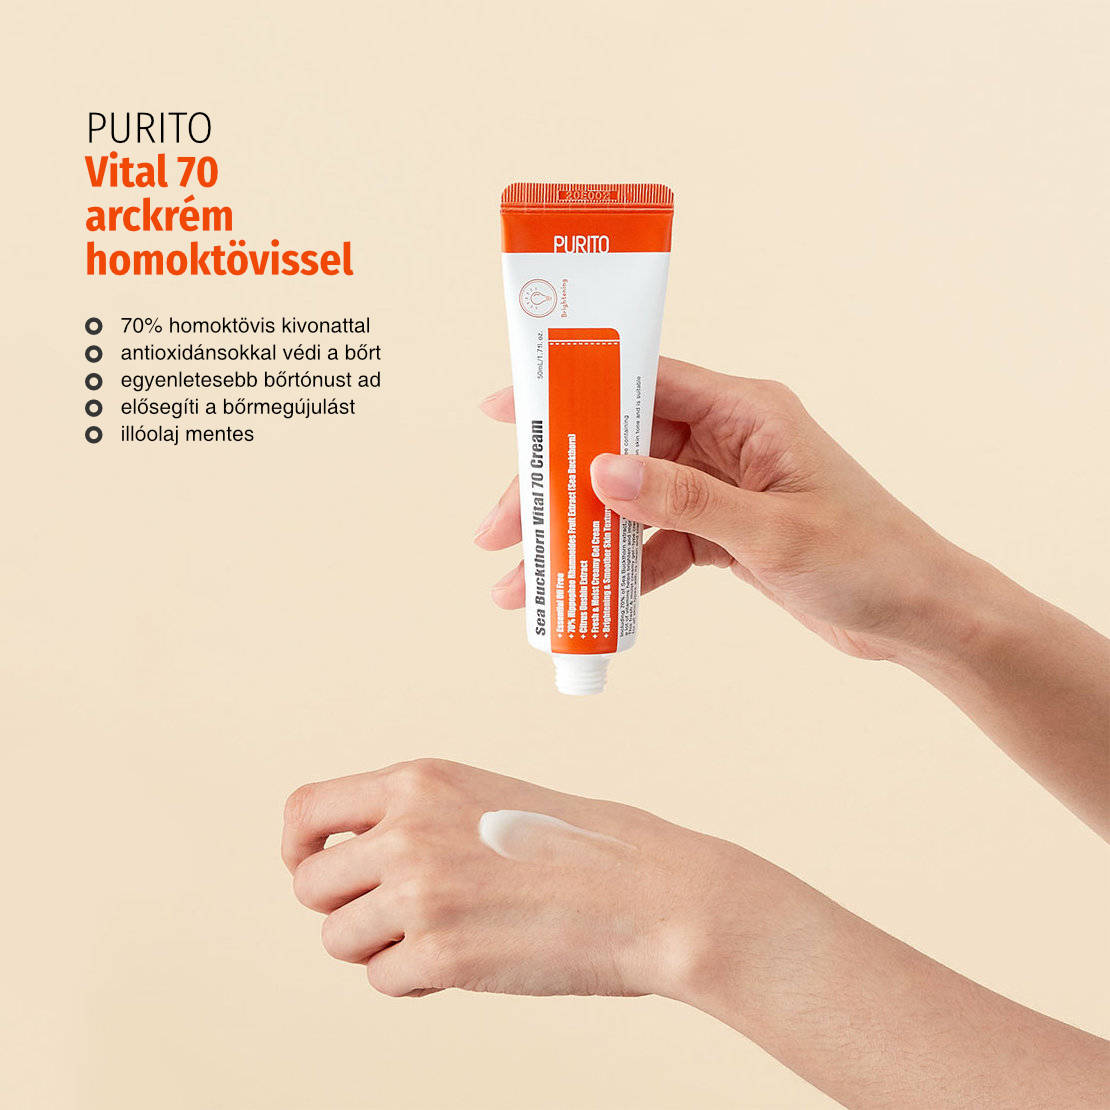 purito-vital-70-arckrem-homoktovissel-01